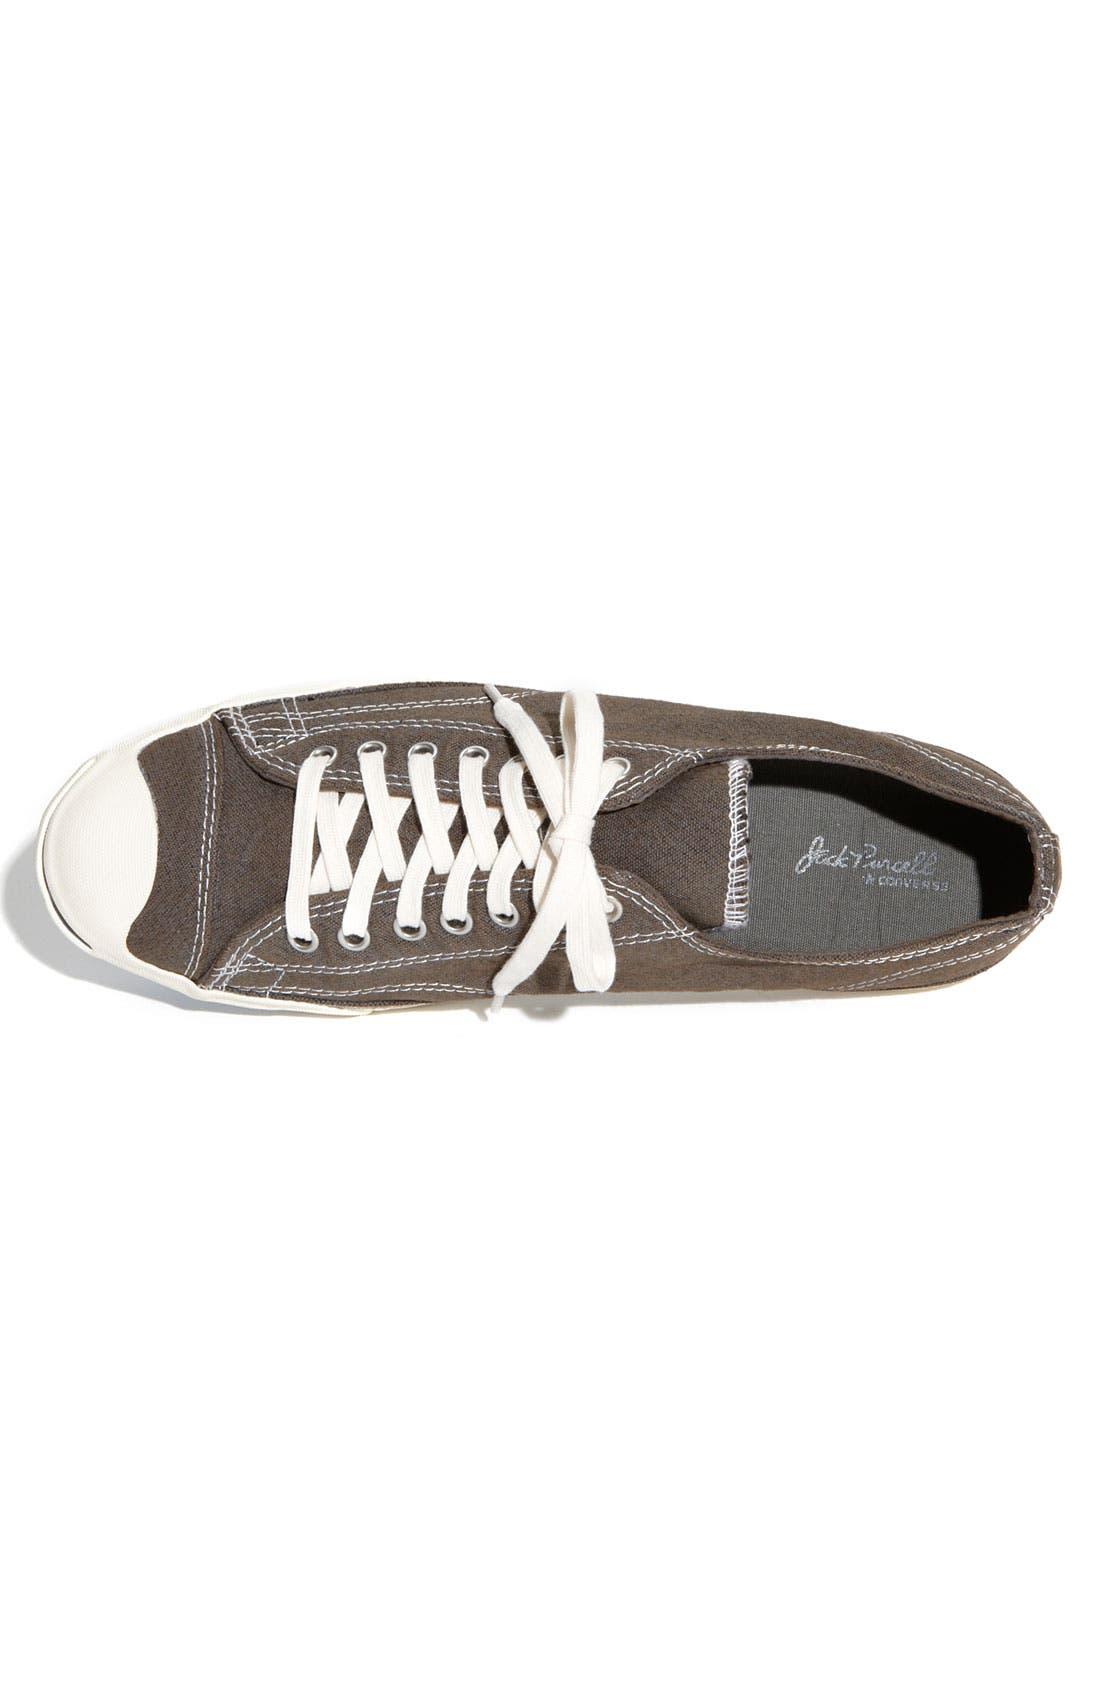 Alternate Image 3  - Converse 'Jack Purcell' Sneaker